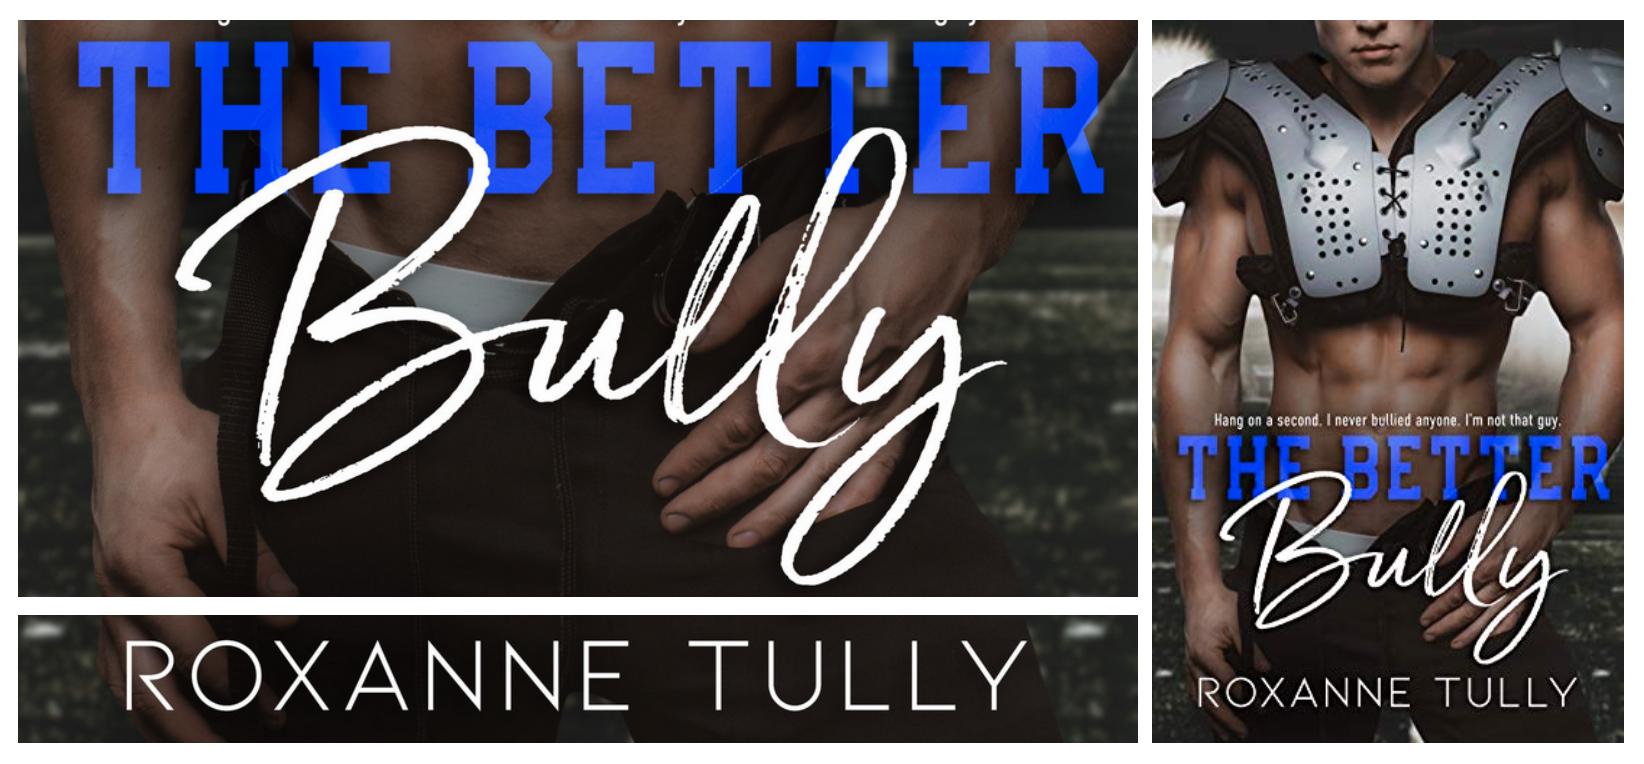 the better bully